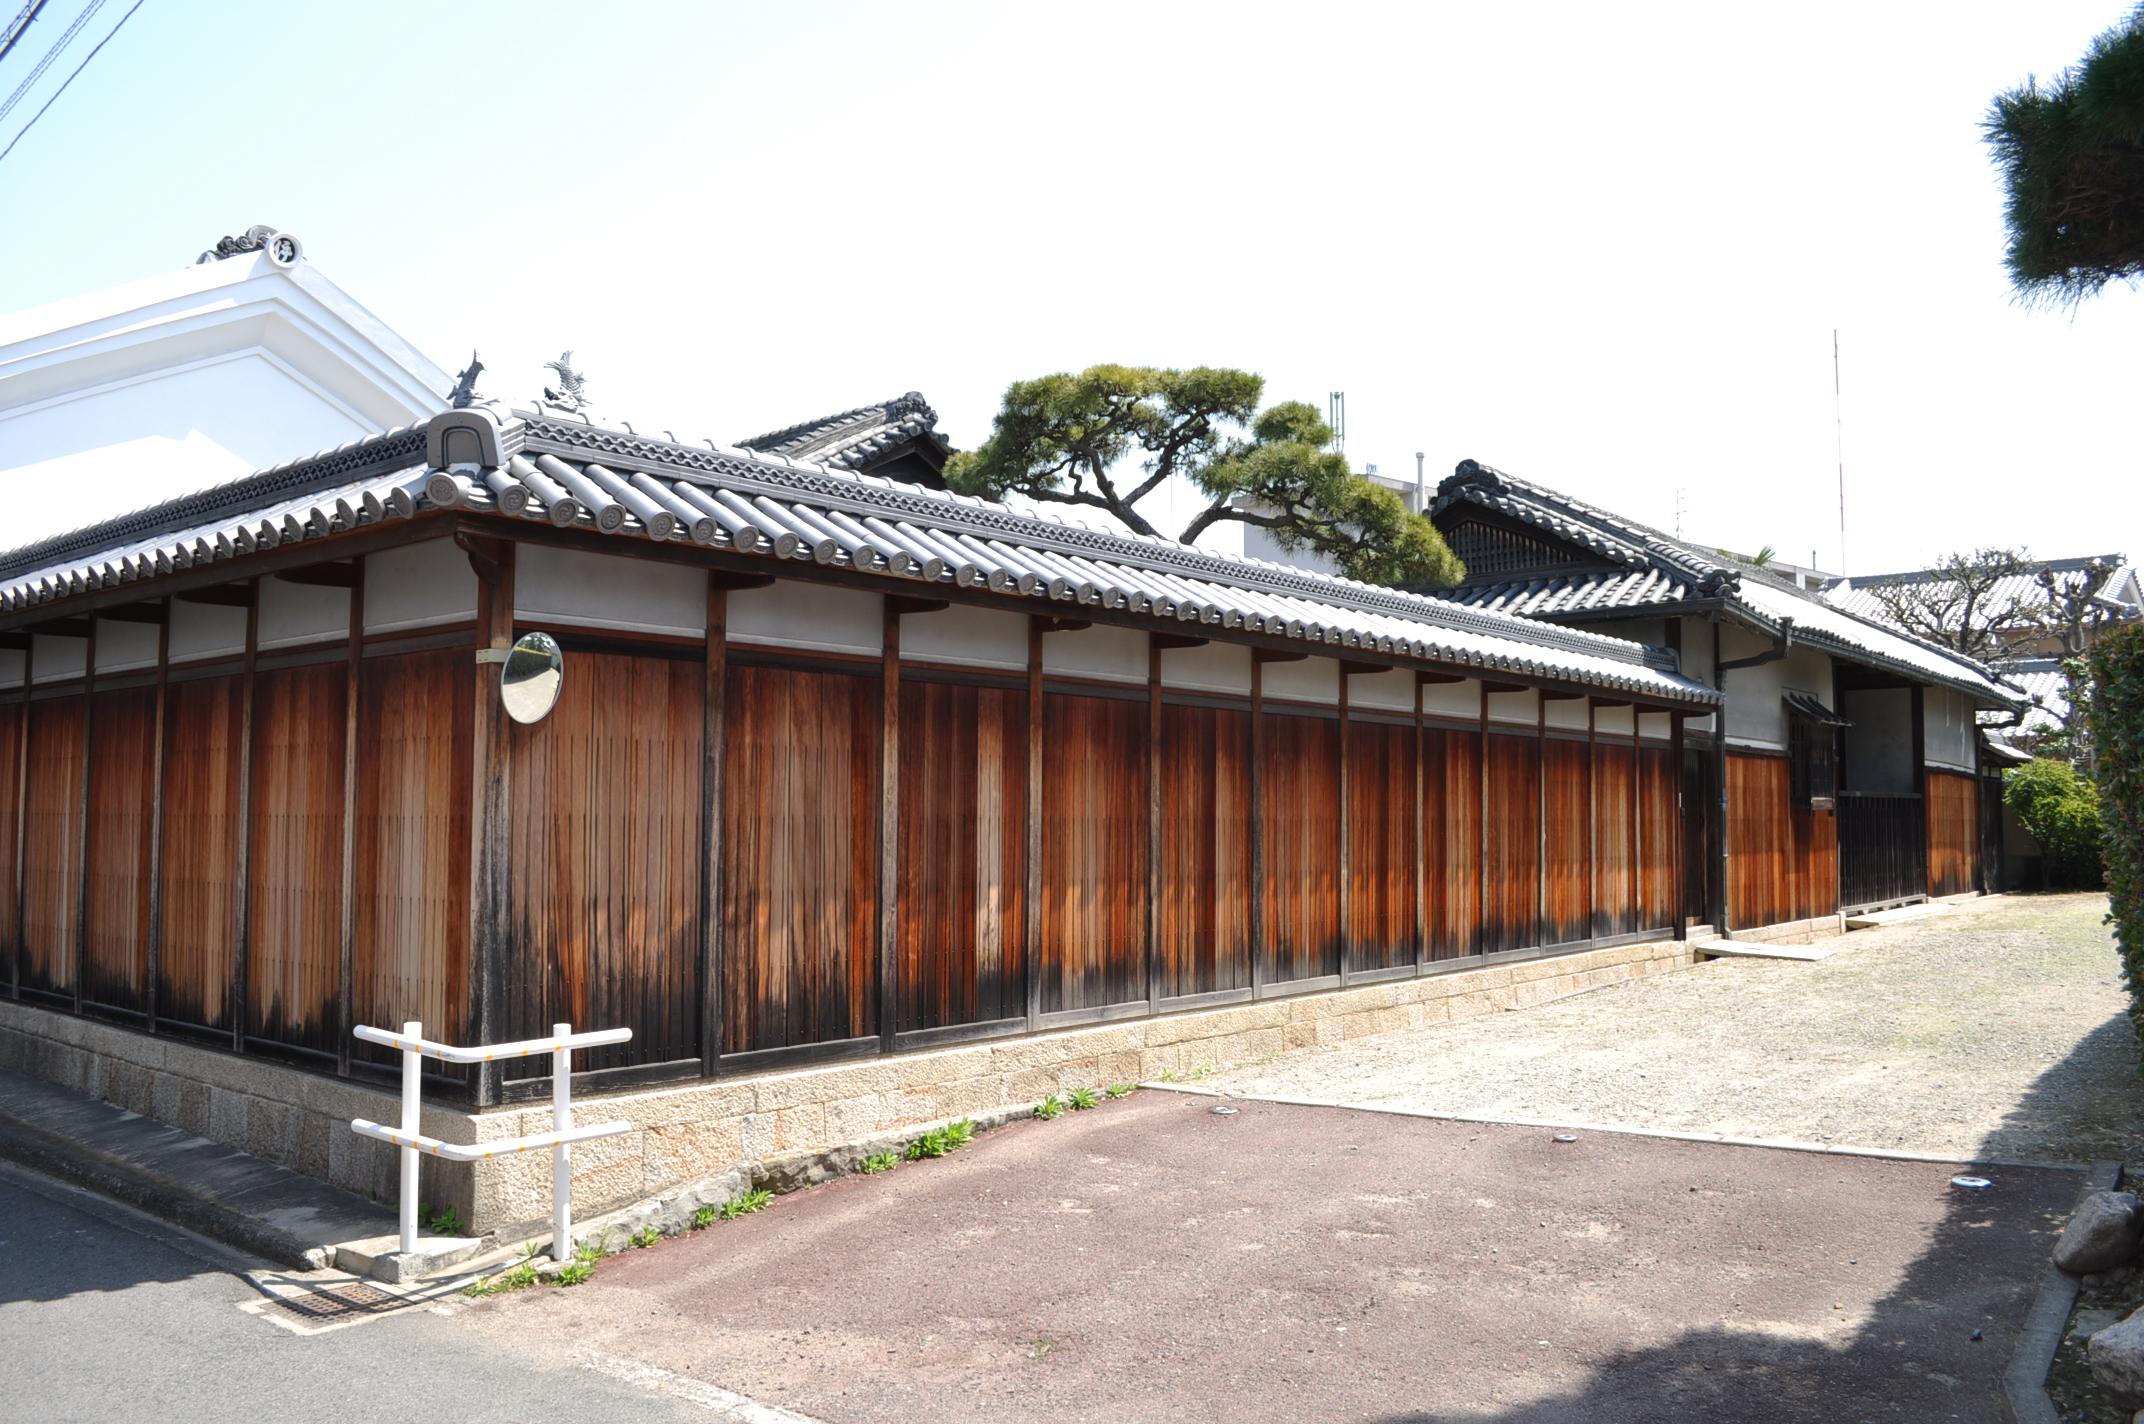 <p>地域の景観の核となる長屋門</p>中央は内開き板戸,左右は背面に戸口をもつ室とする。外壁は鼠漆喰塗と真壁造を併用し,出格子窓を設ける。